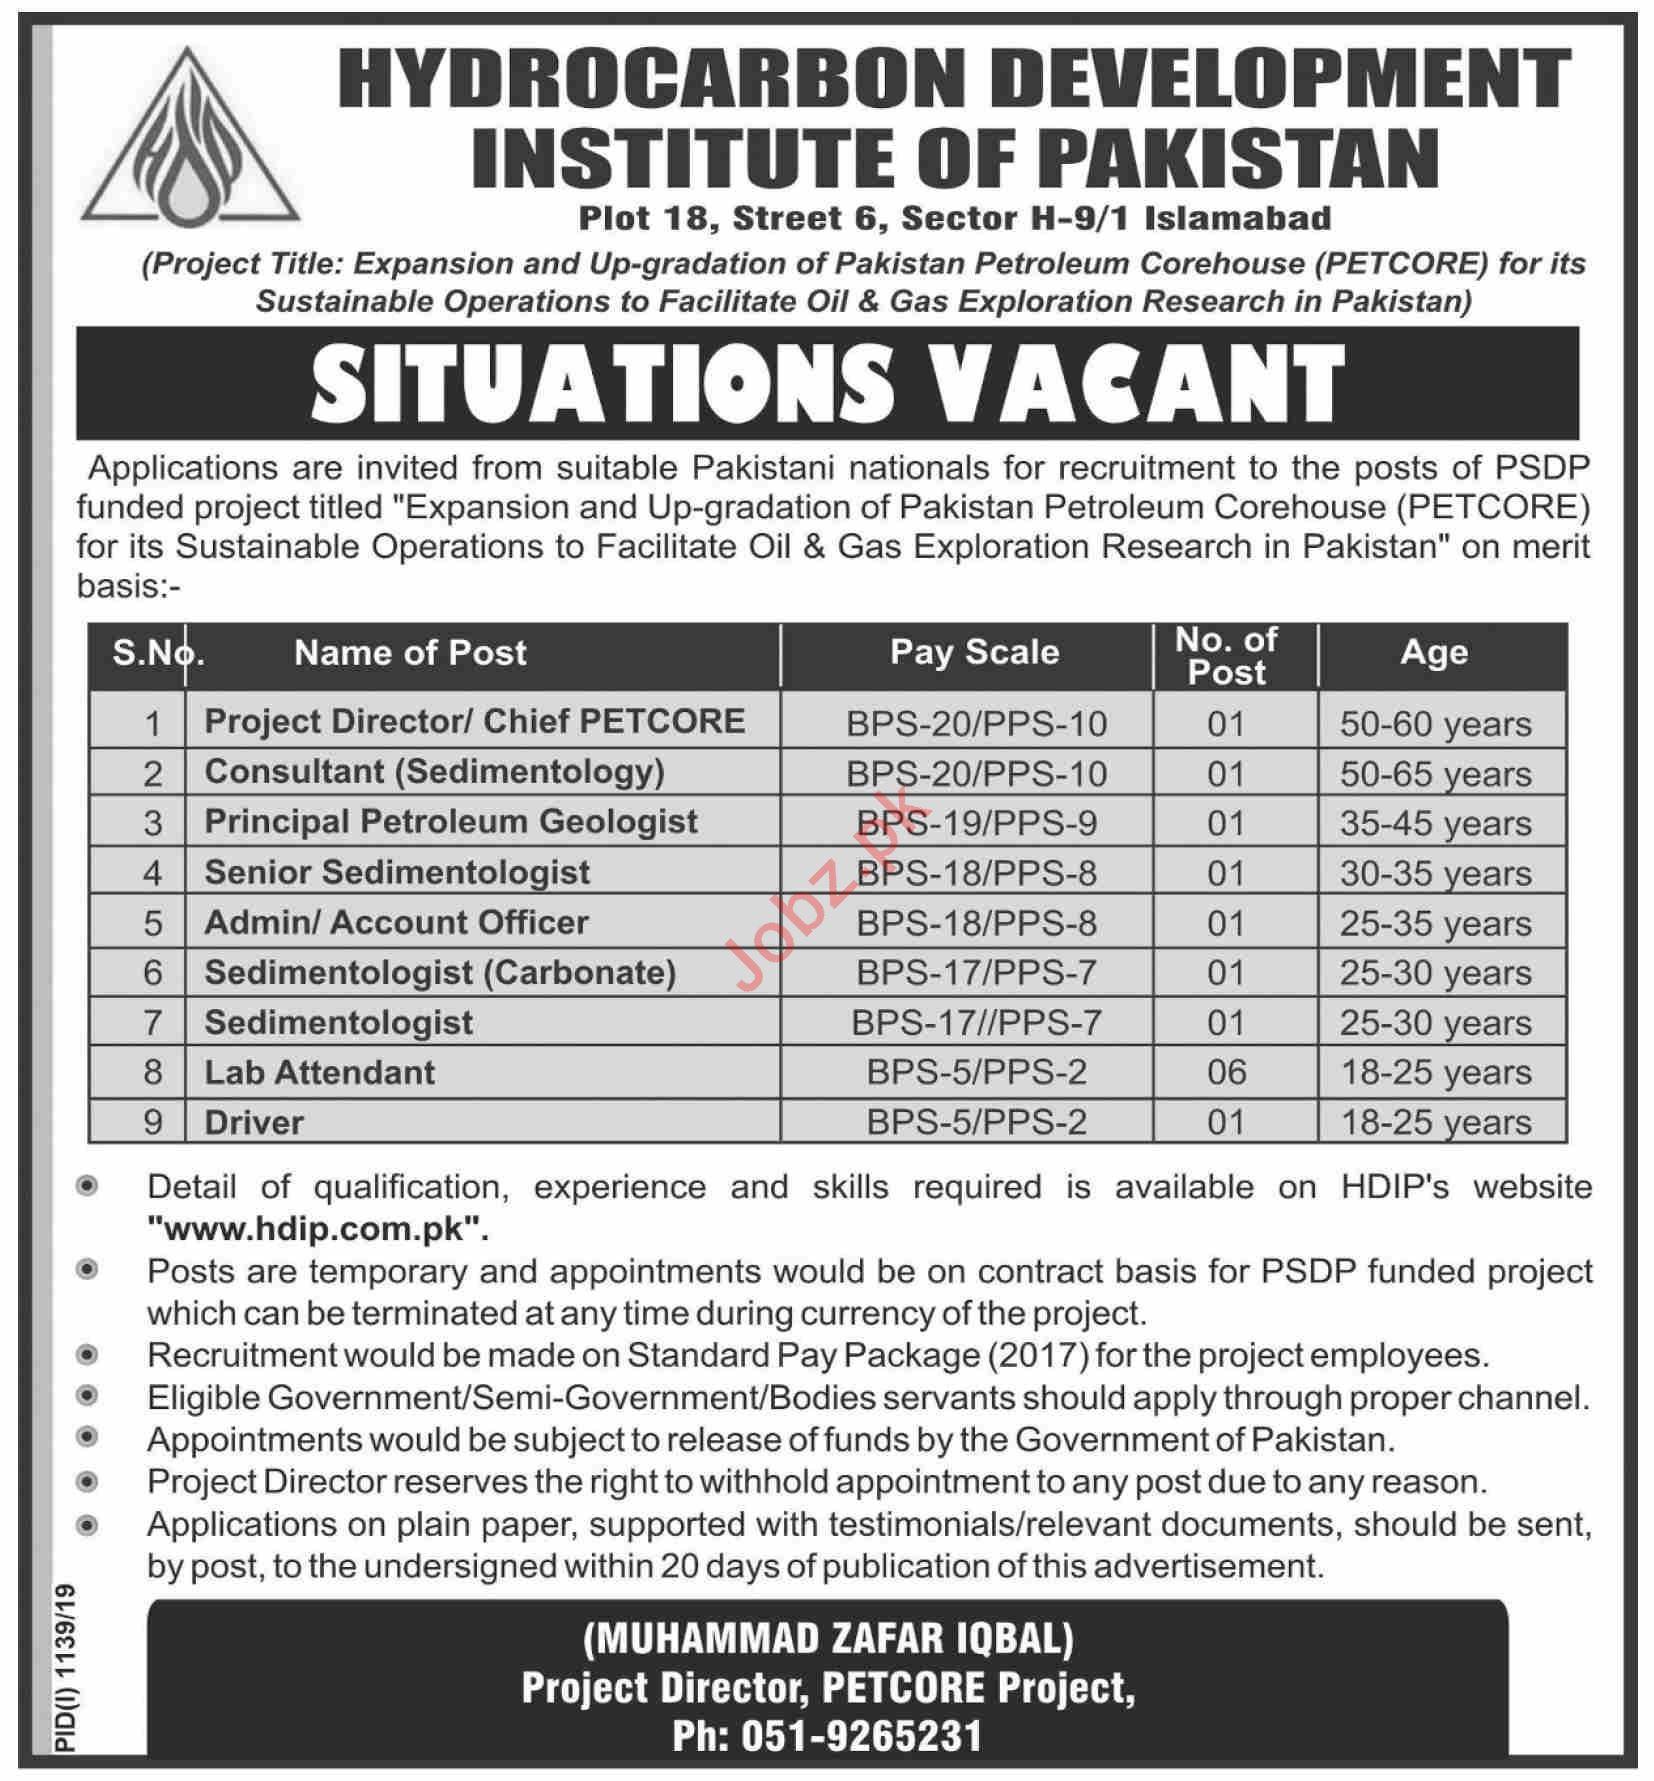 Hydrocarbon Development Institute of Pakistan HDIP Jobs 2019